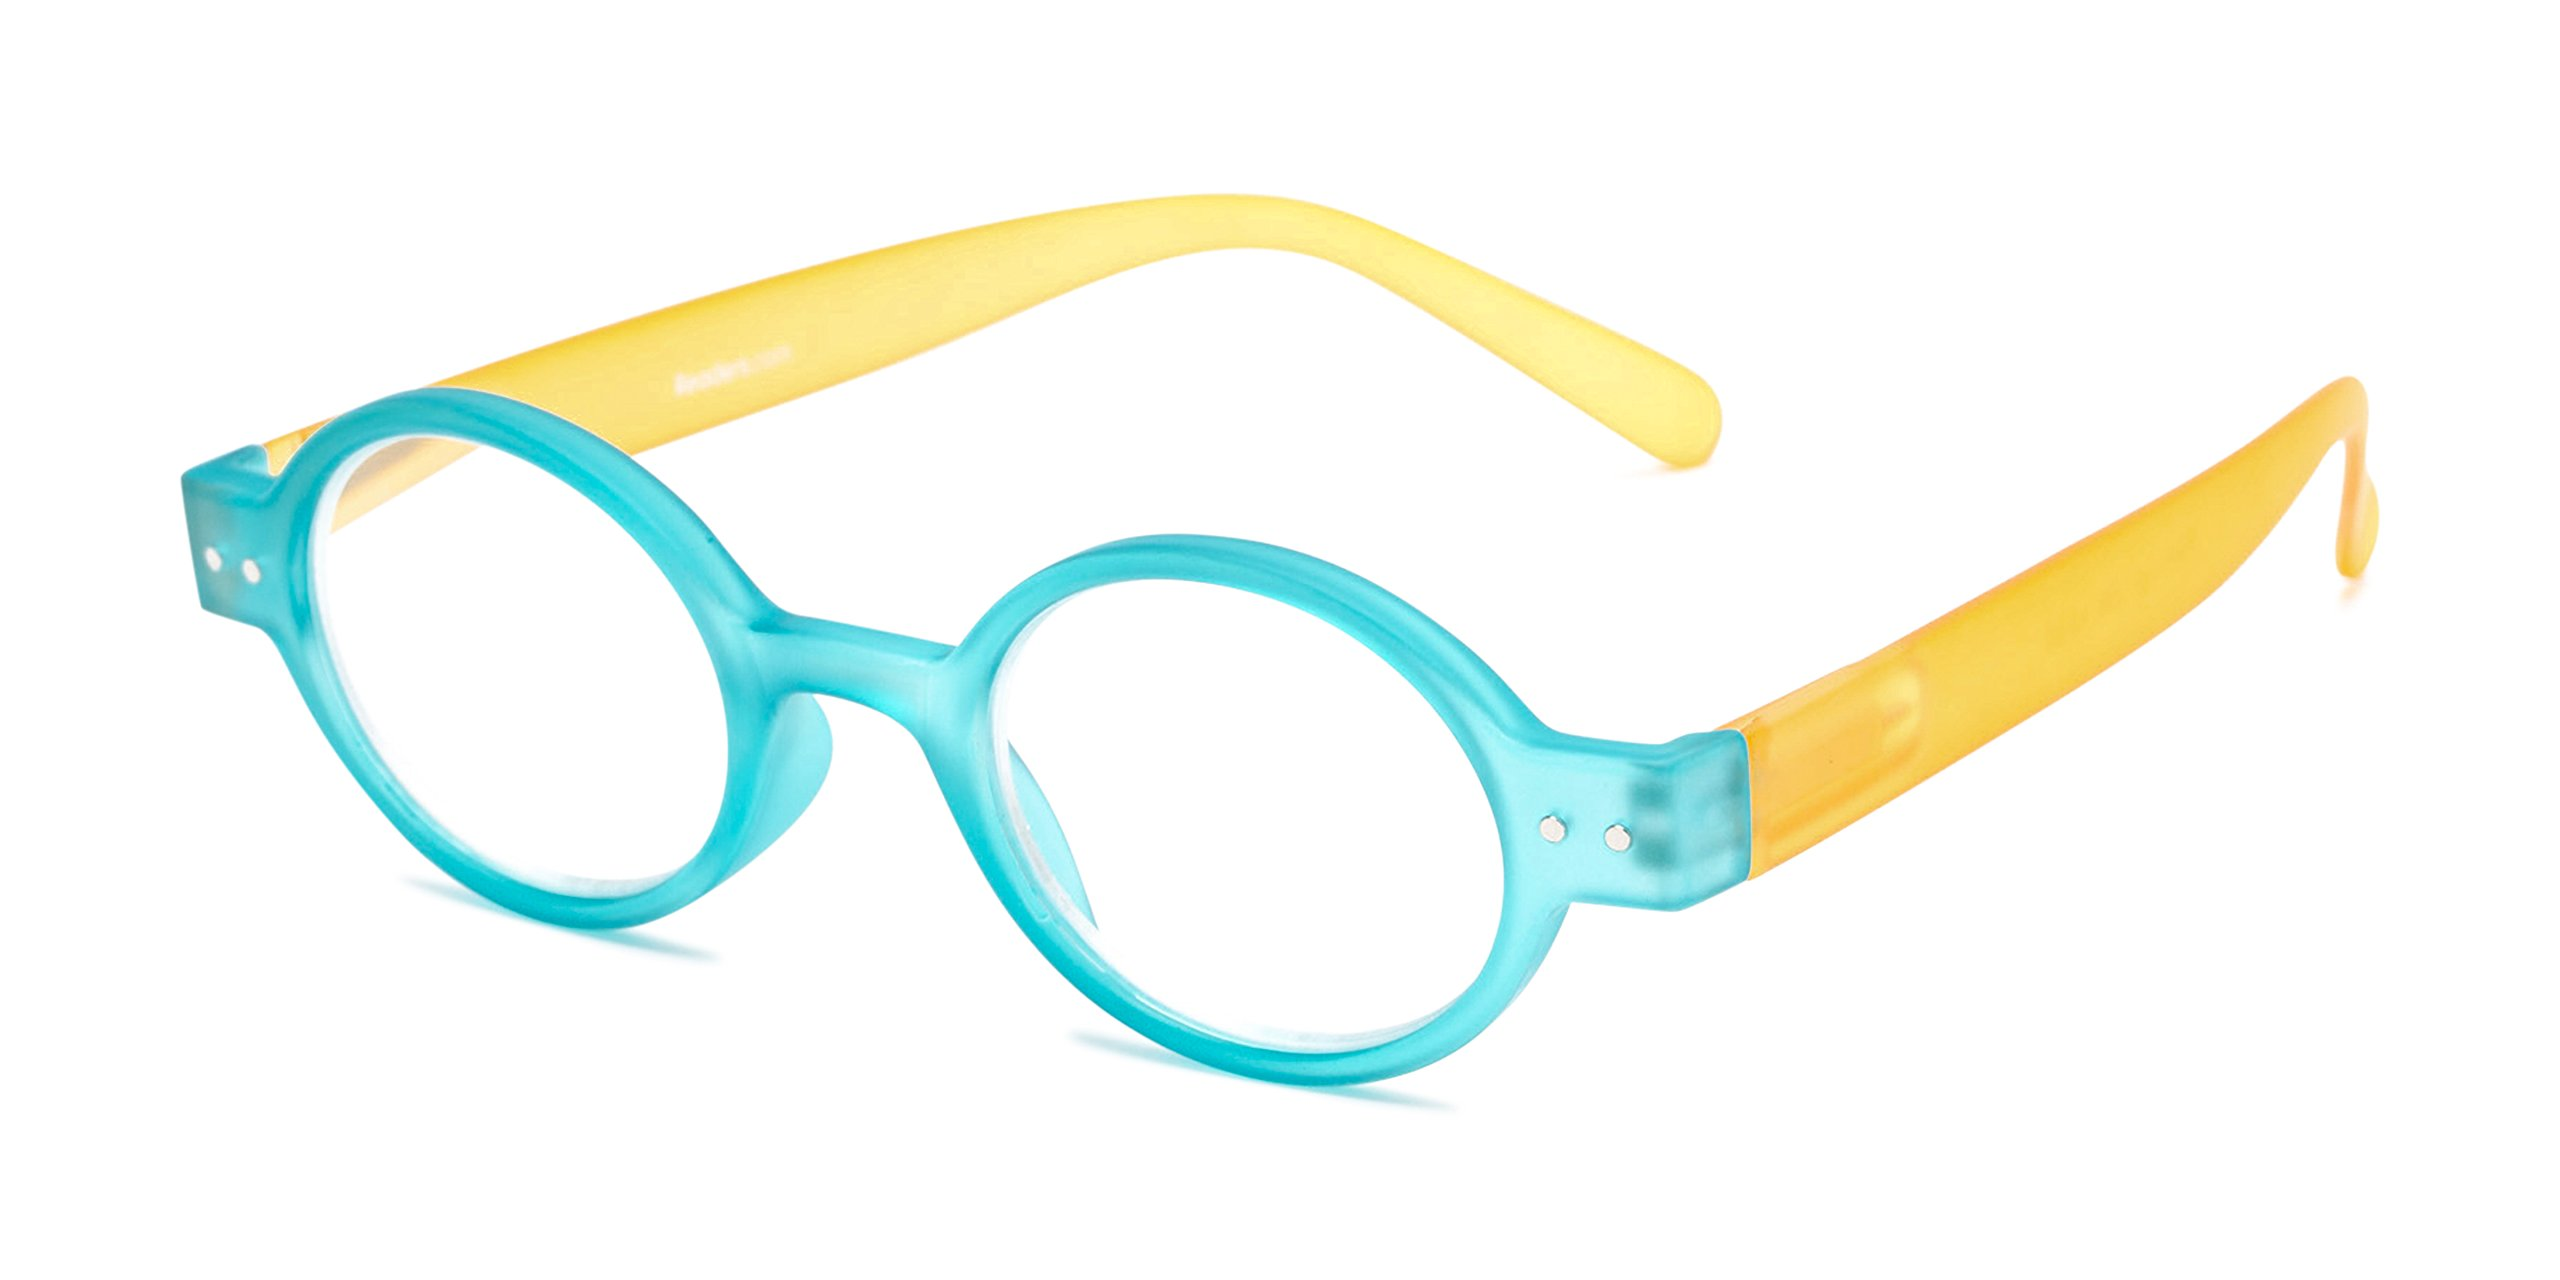 The Flamingo +1.75 Blue/Yellow Reading Glasses